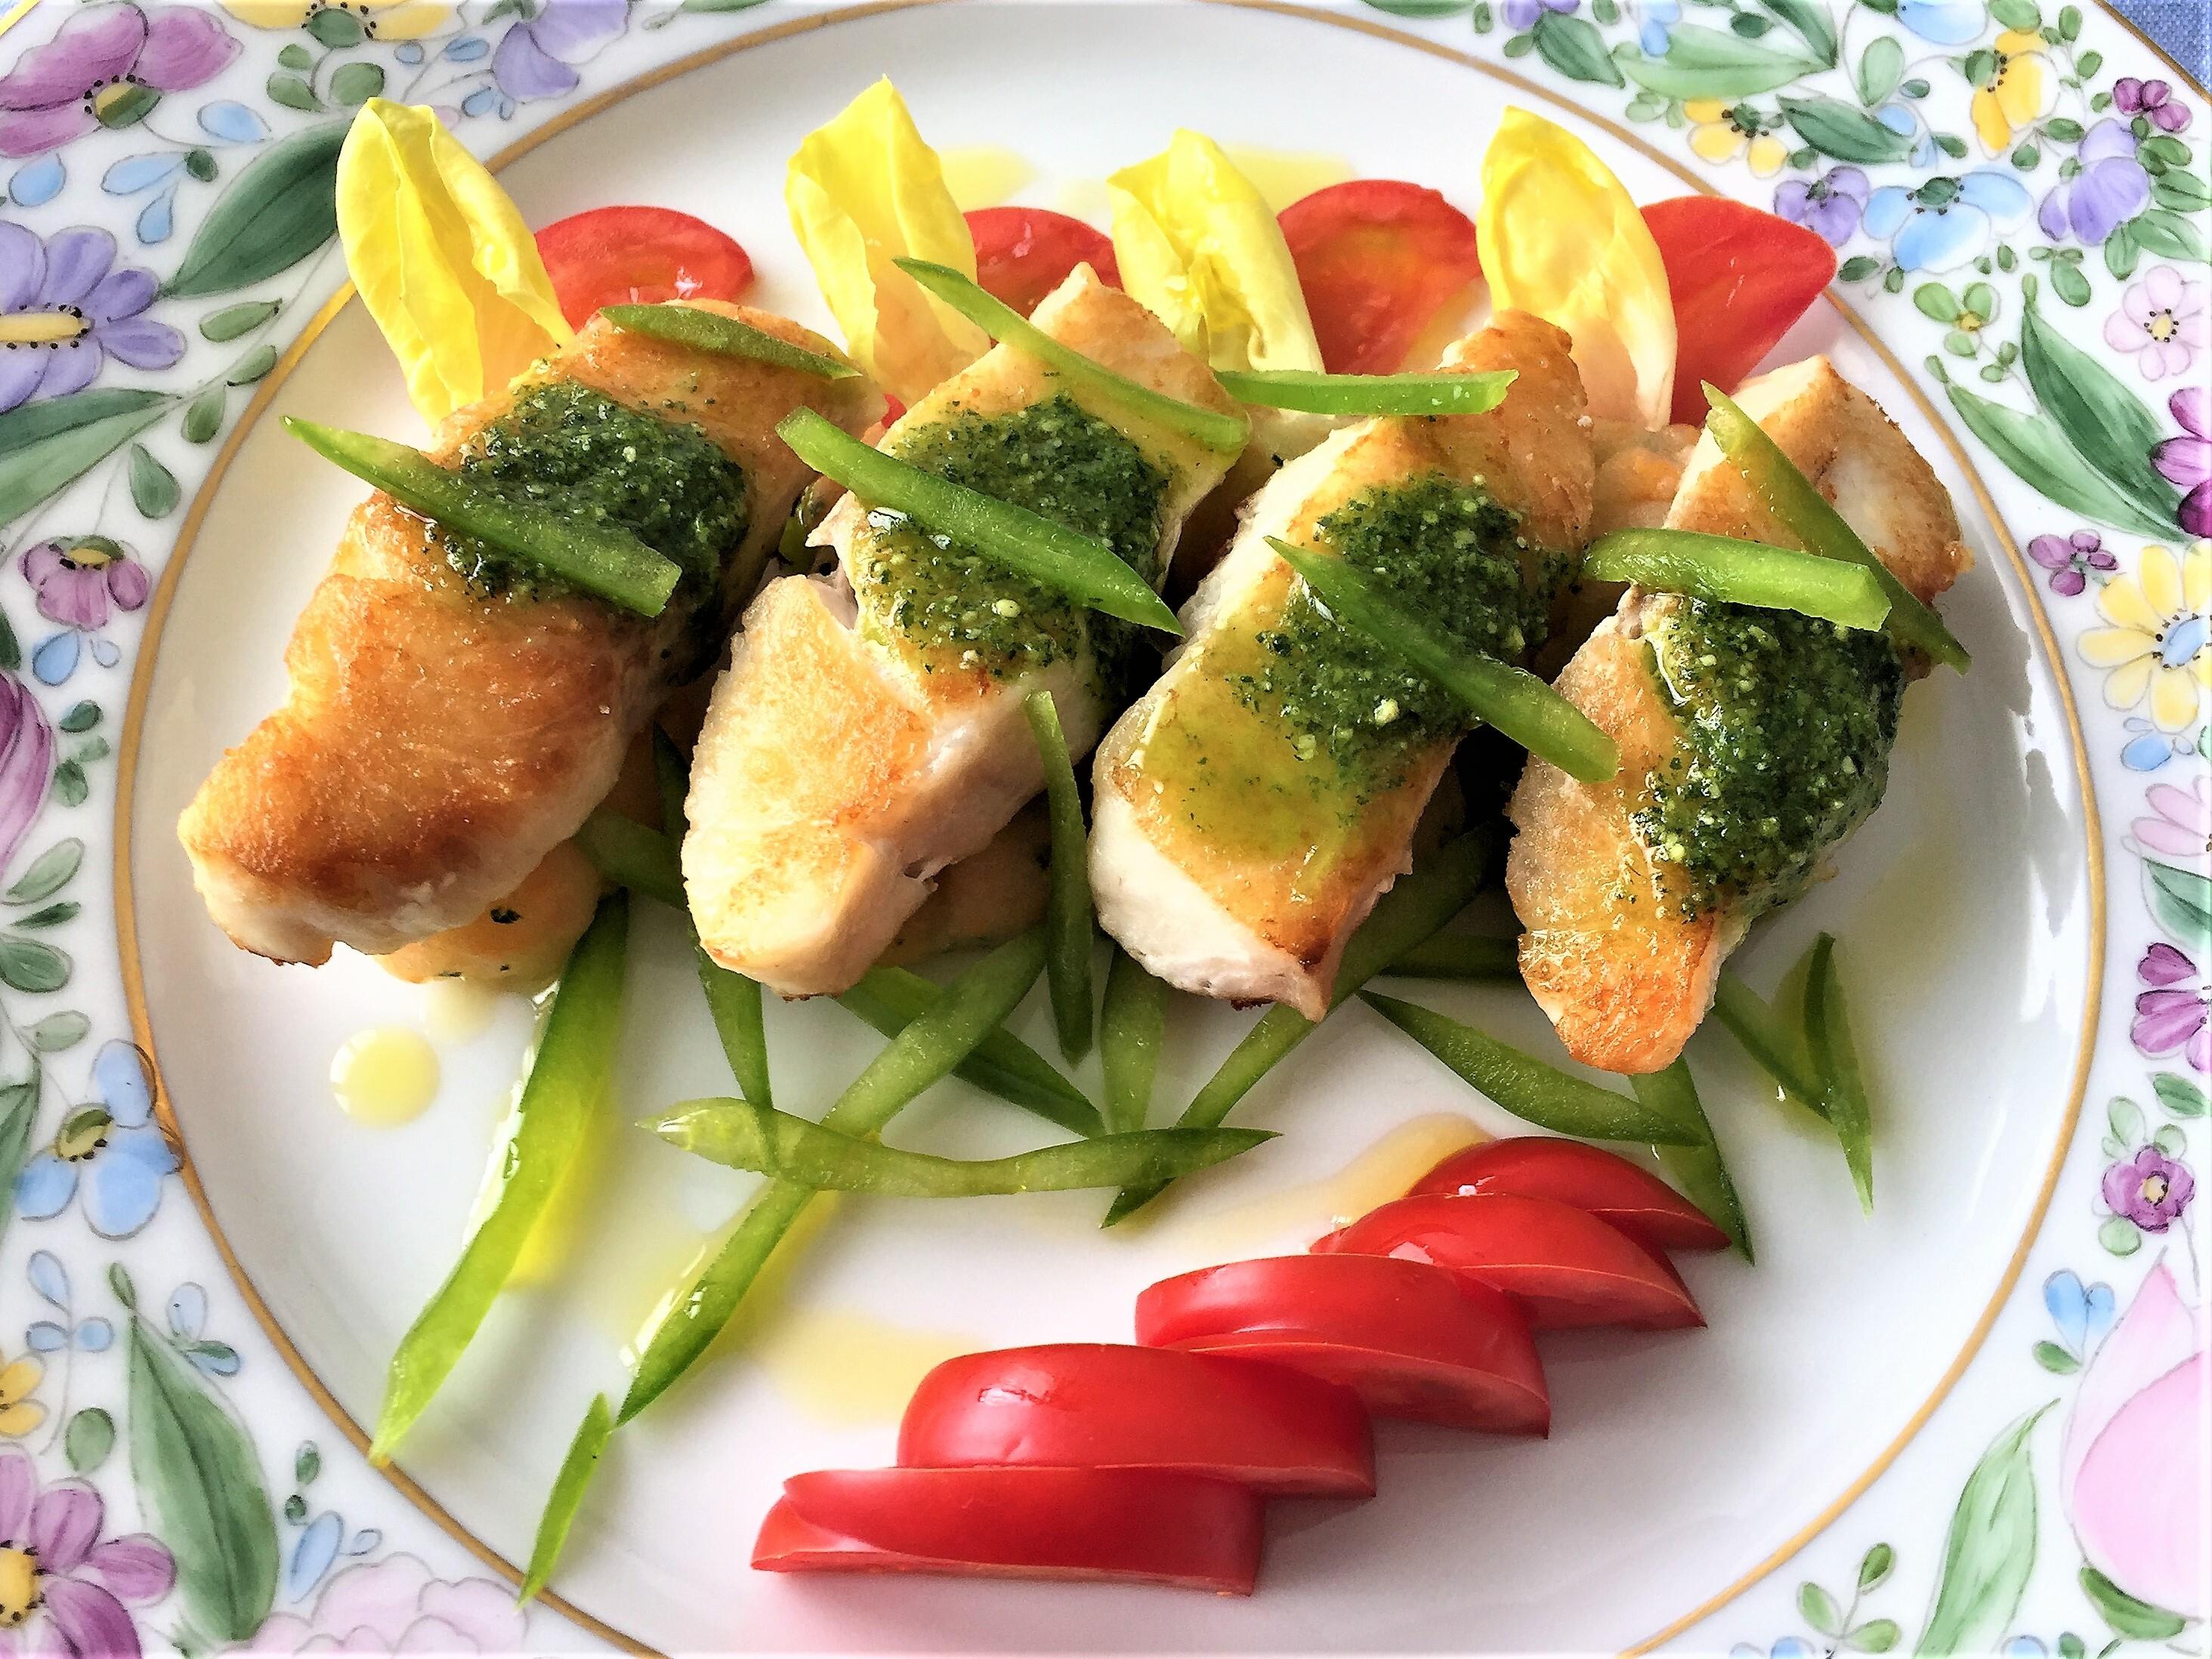 Filetto-di-merluzzo-sopra-purè-di-carota-e-salsa-verde